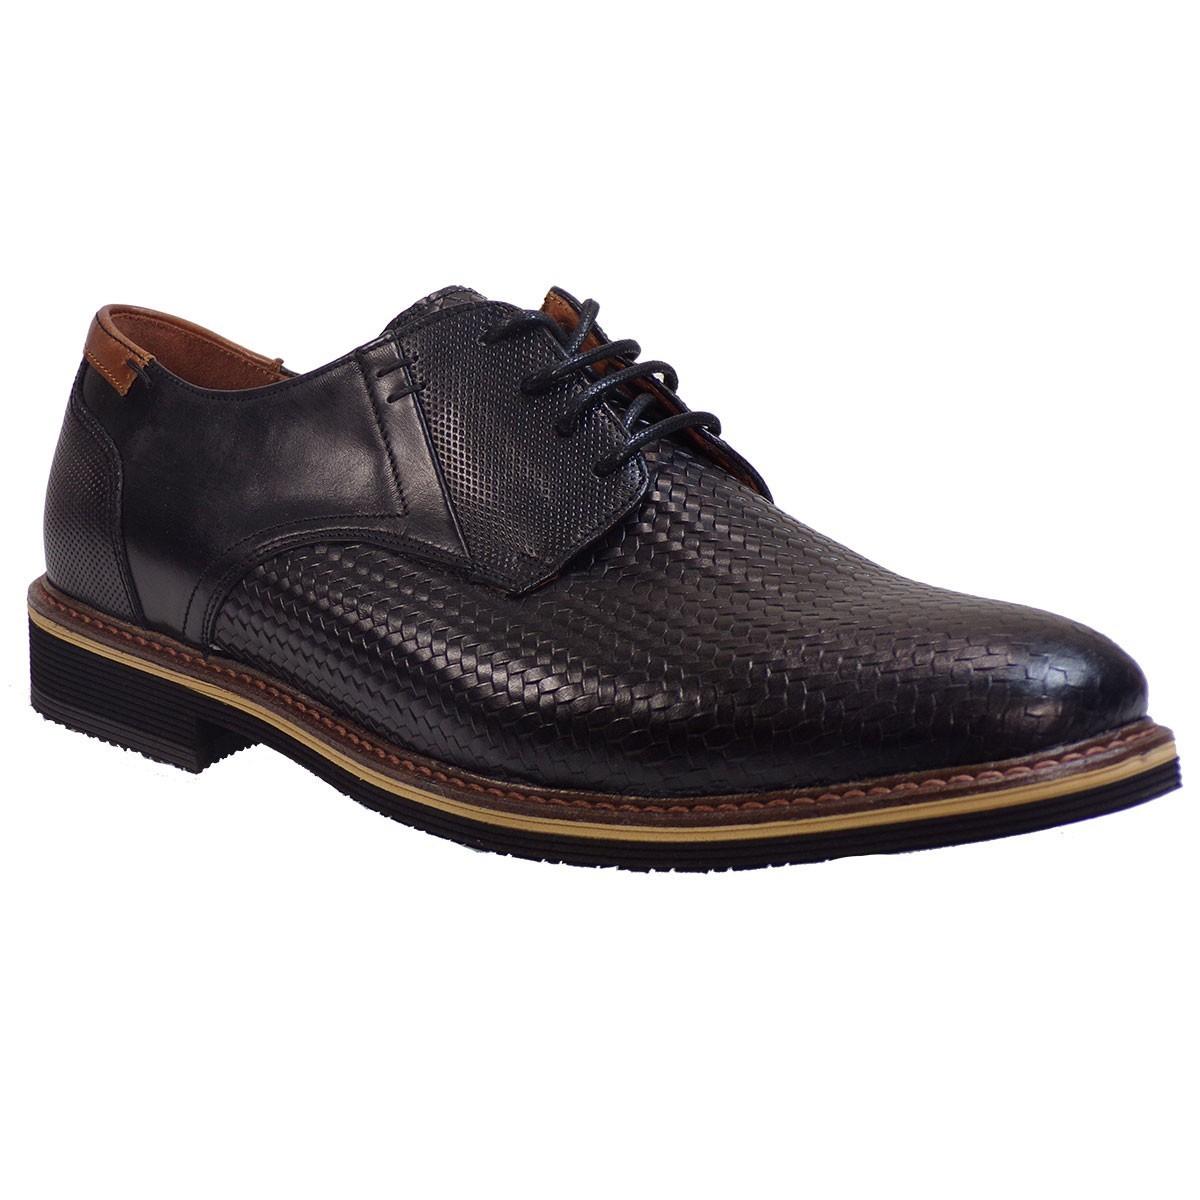 kricket Ανδρικά Παπούτσια 093 Μαύρο Δέρμα Ψάθα